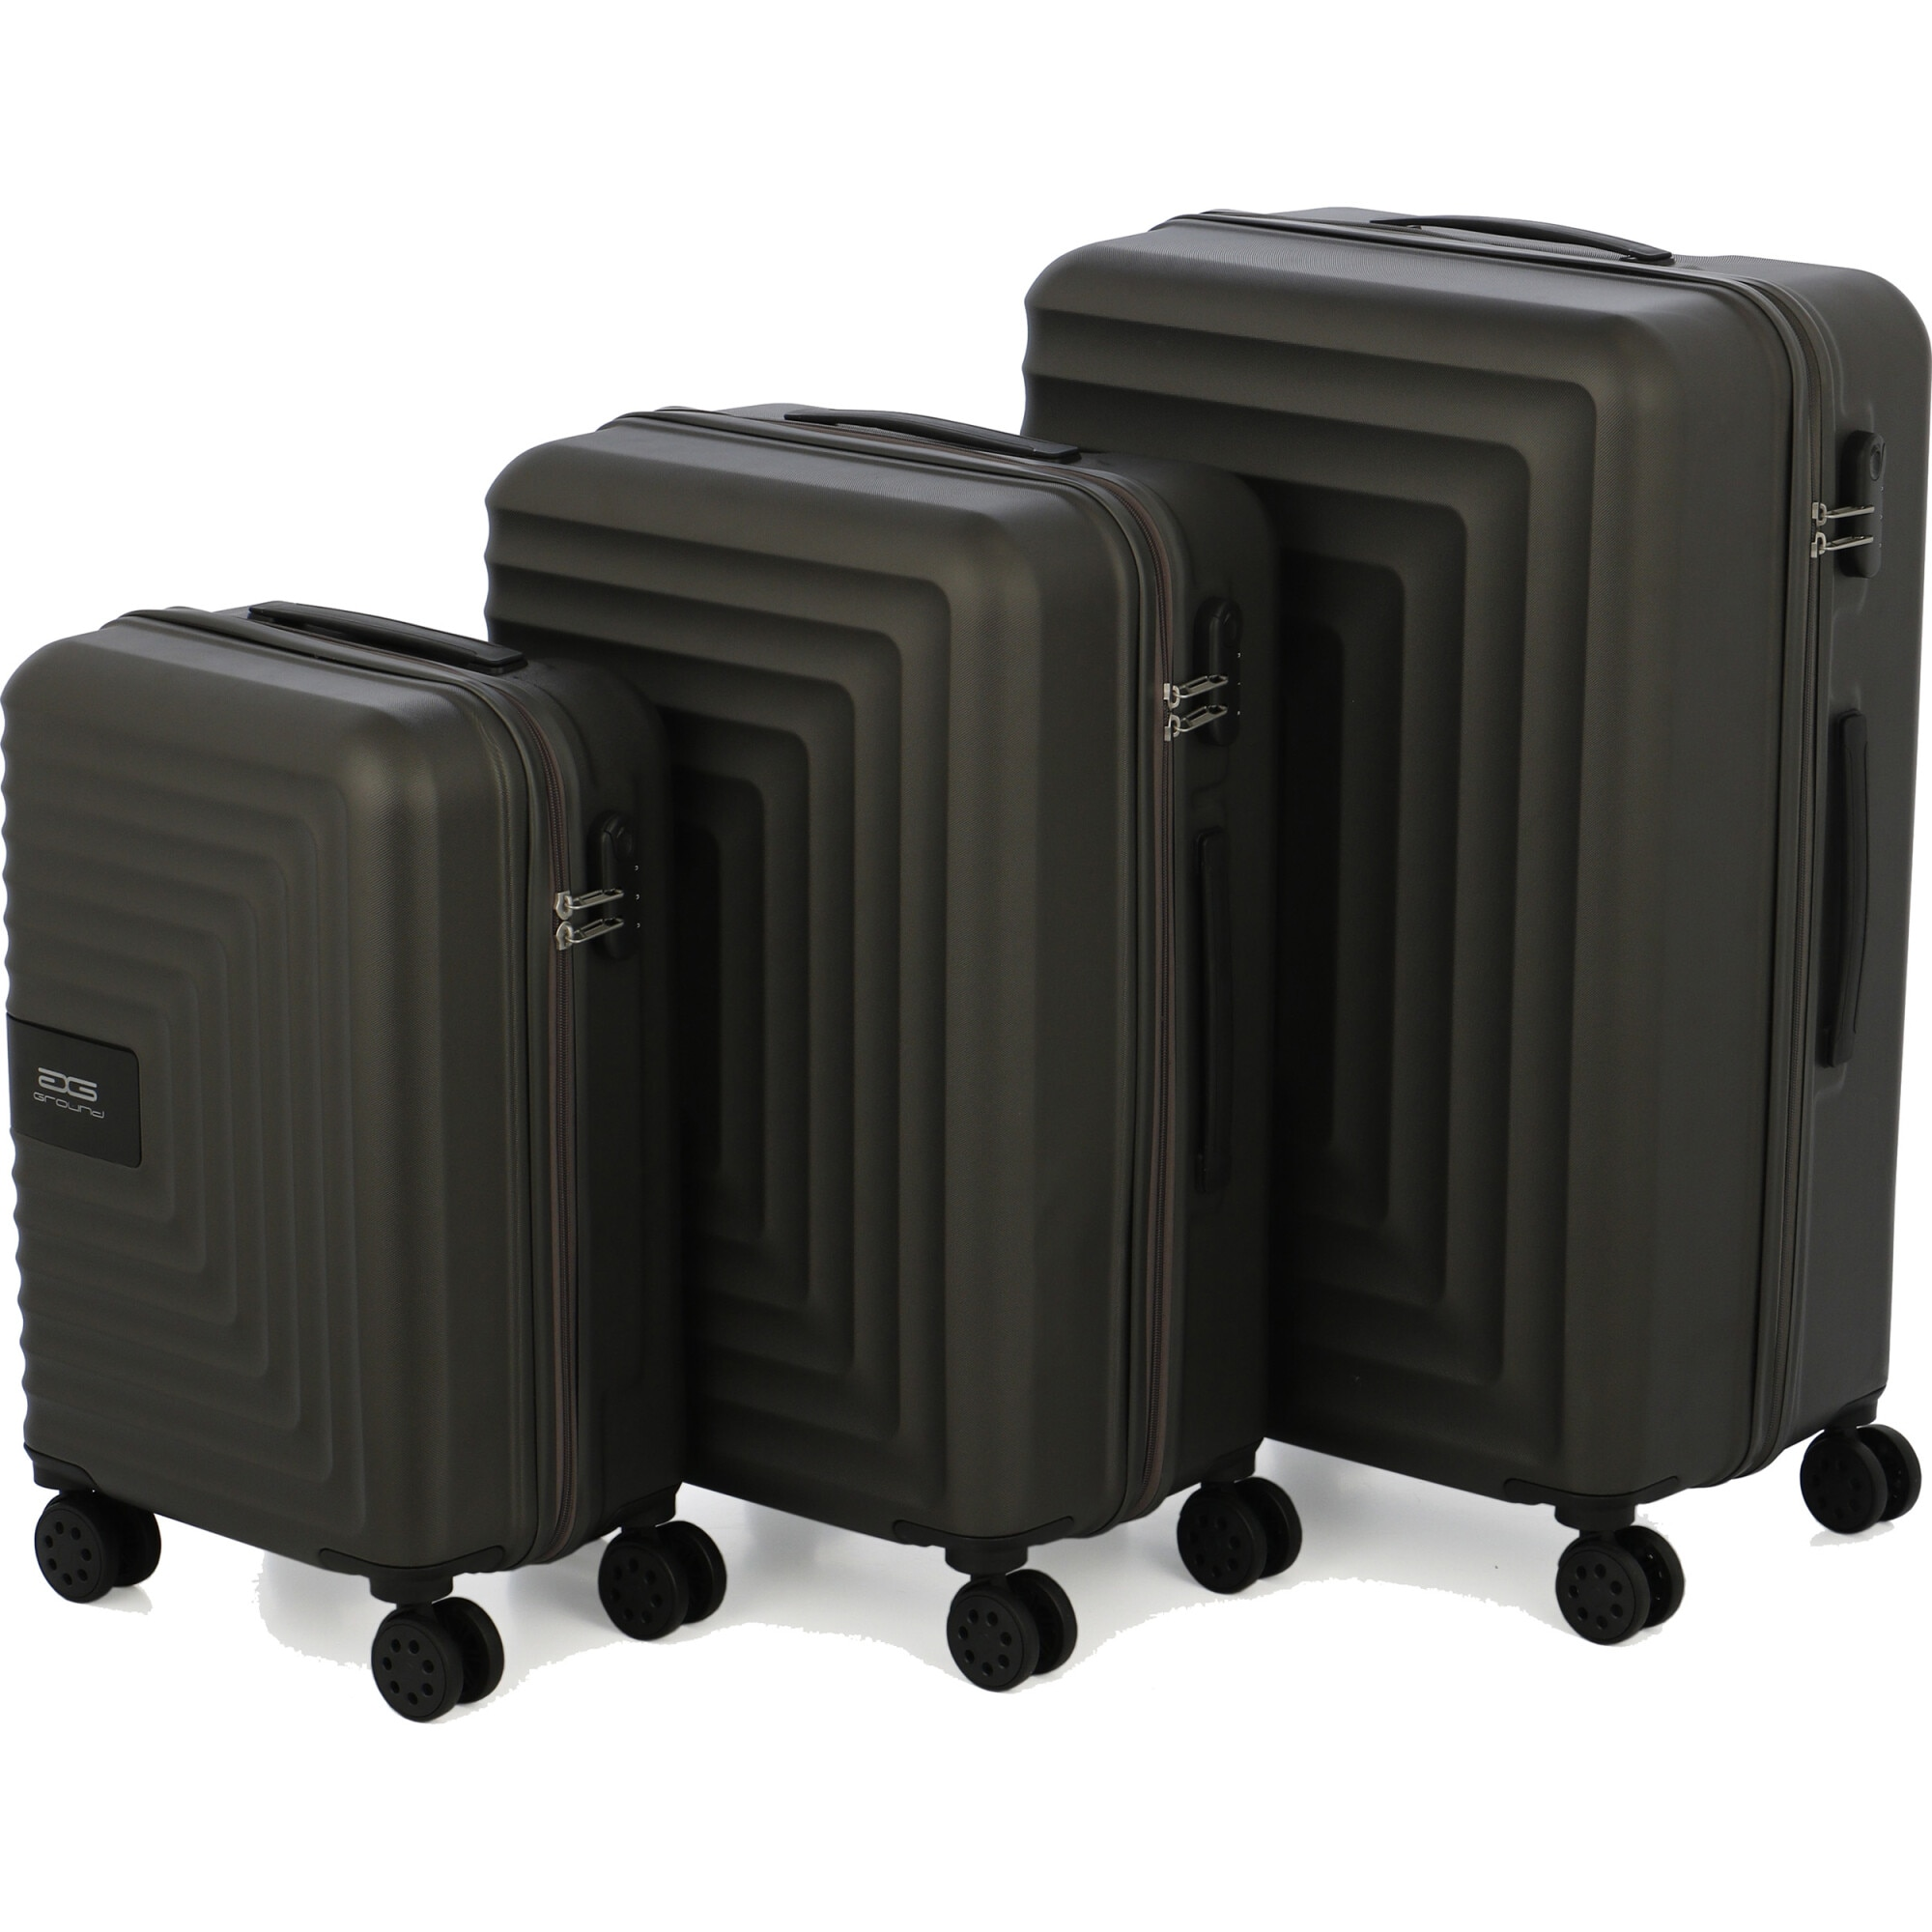 Fotografie Set 3 trolere VELVET, ABS, marime S+M+L, culoare dark-grey